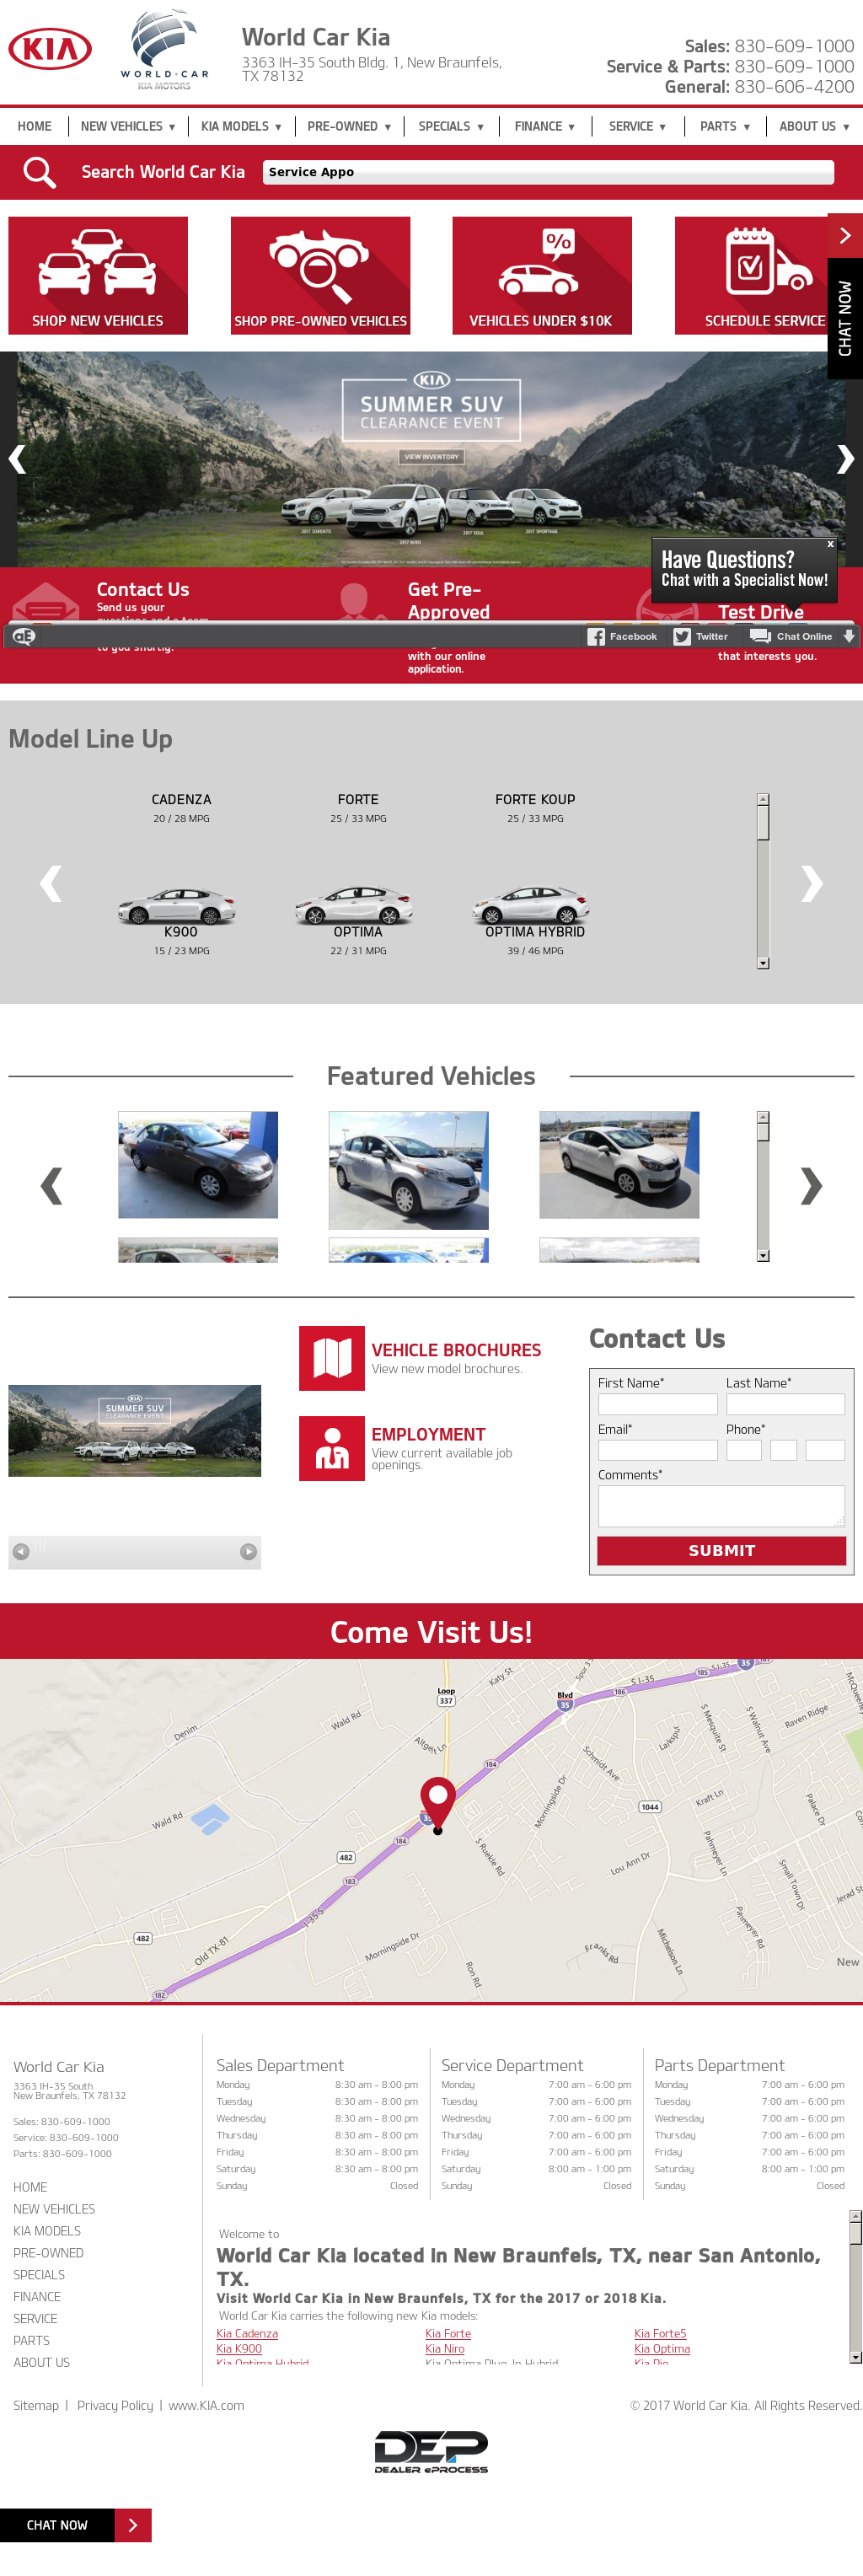 World Car Kia New Braunfels Website History